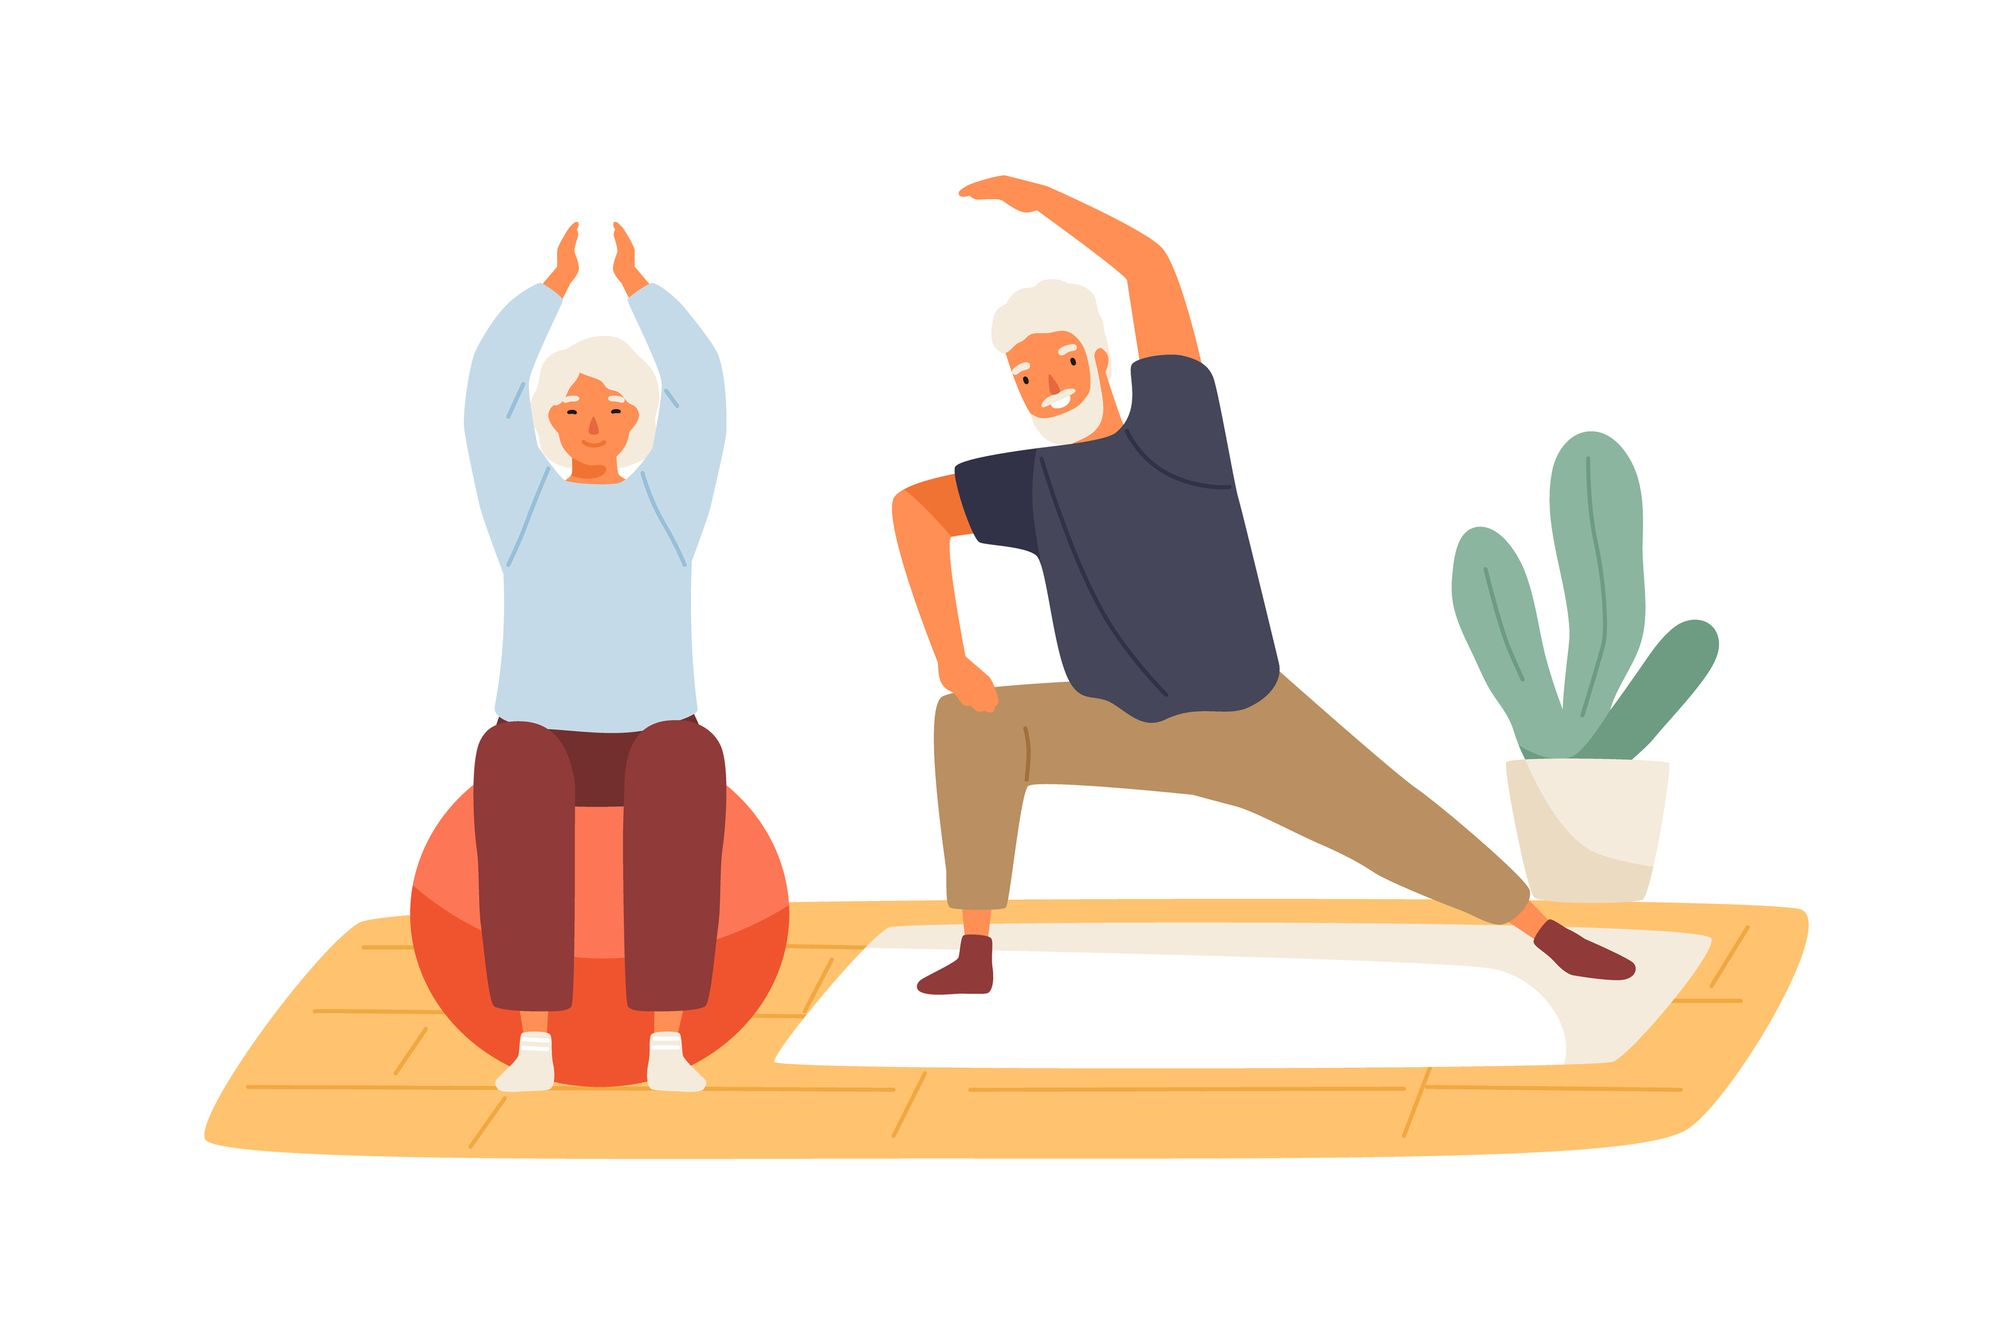 10 Exercises to Improve Balance After Brain Injury